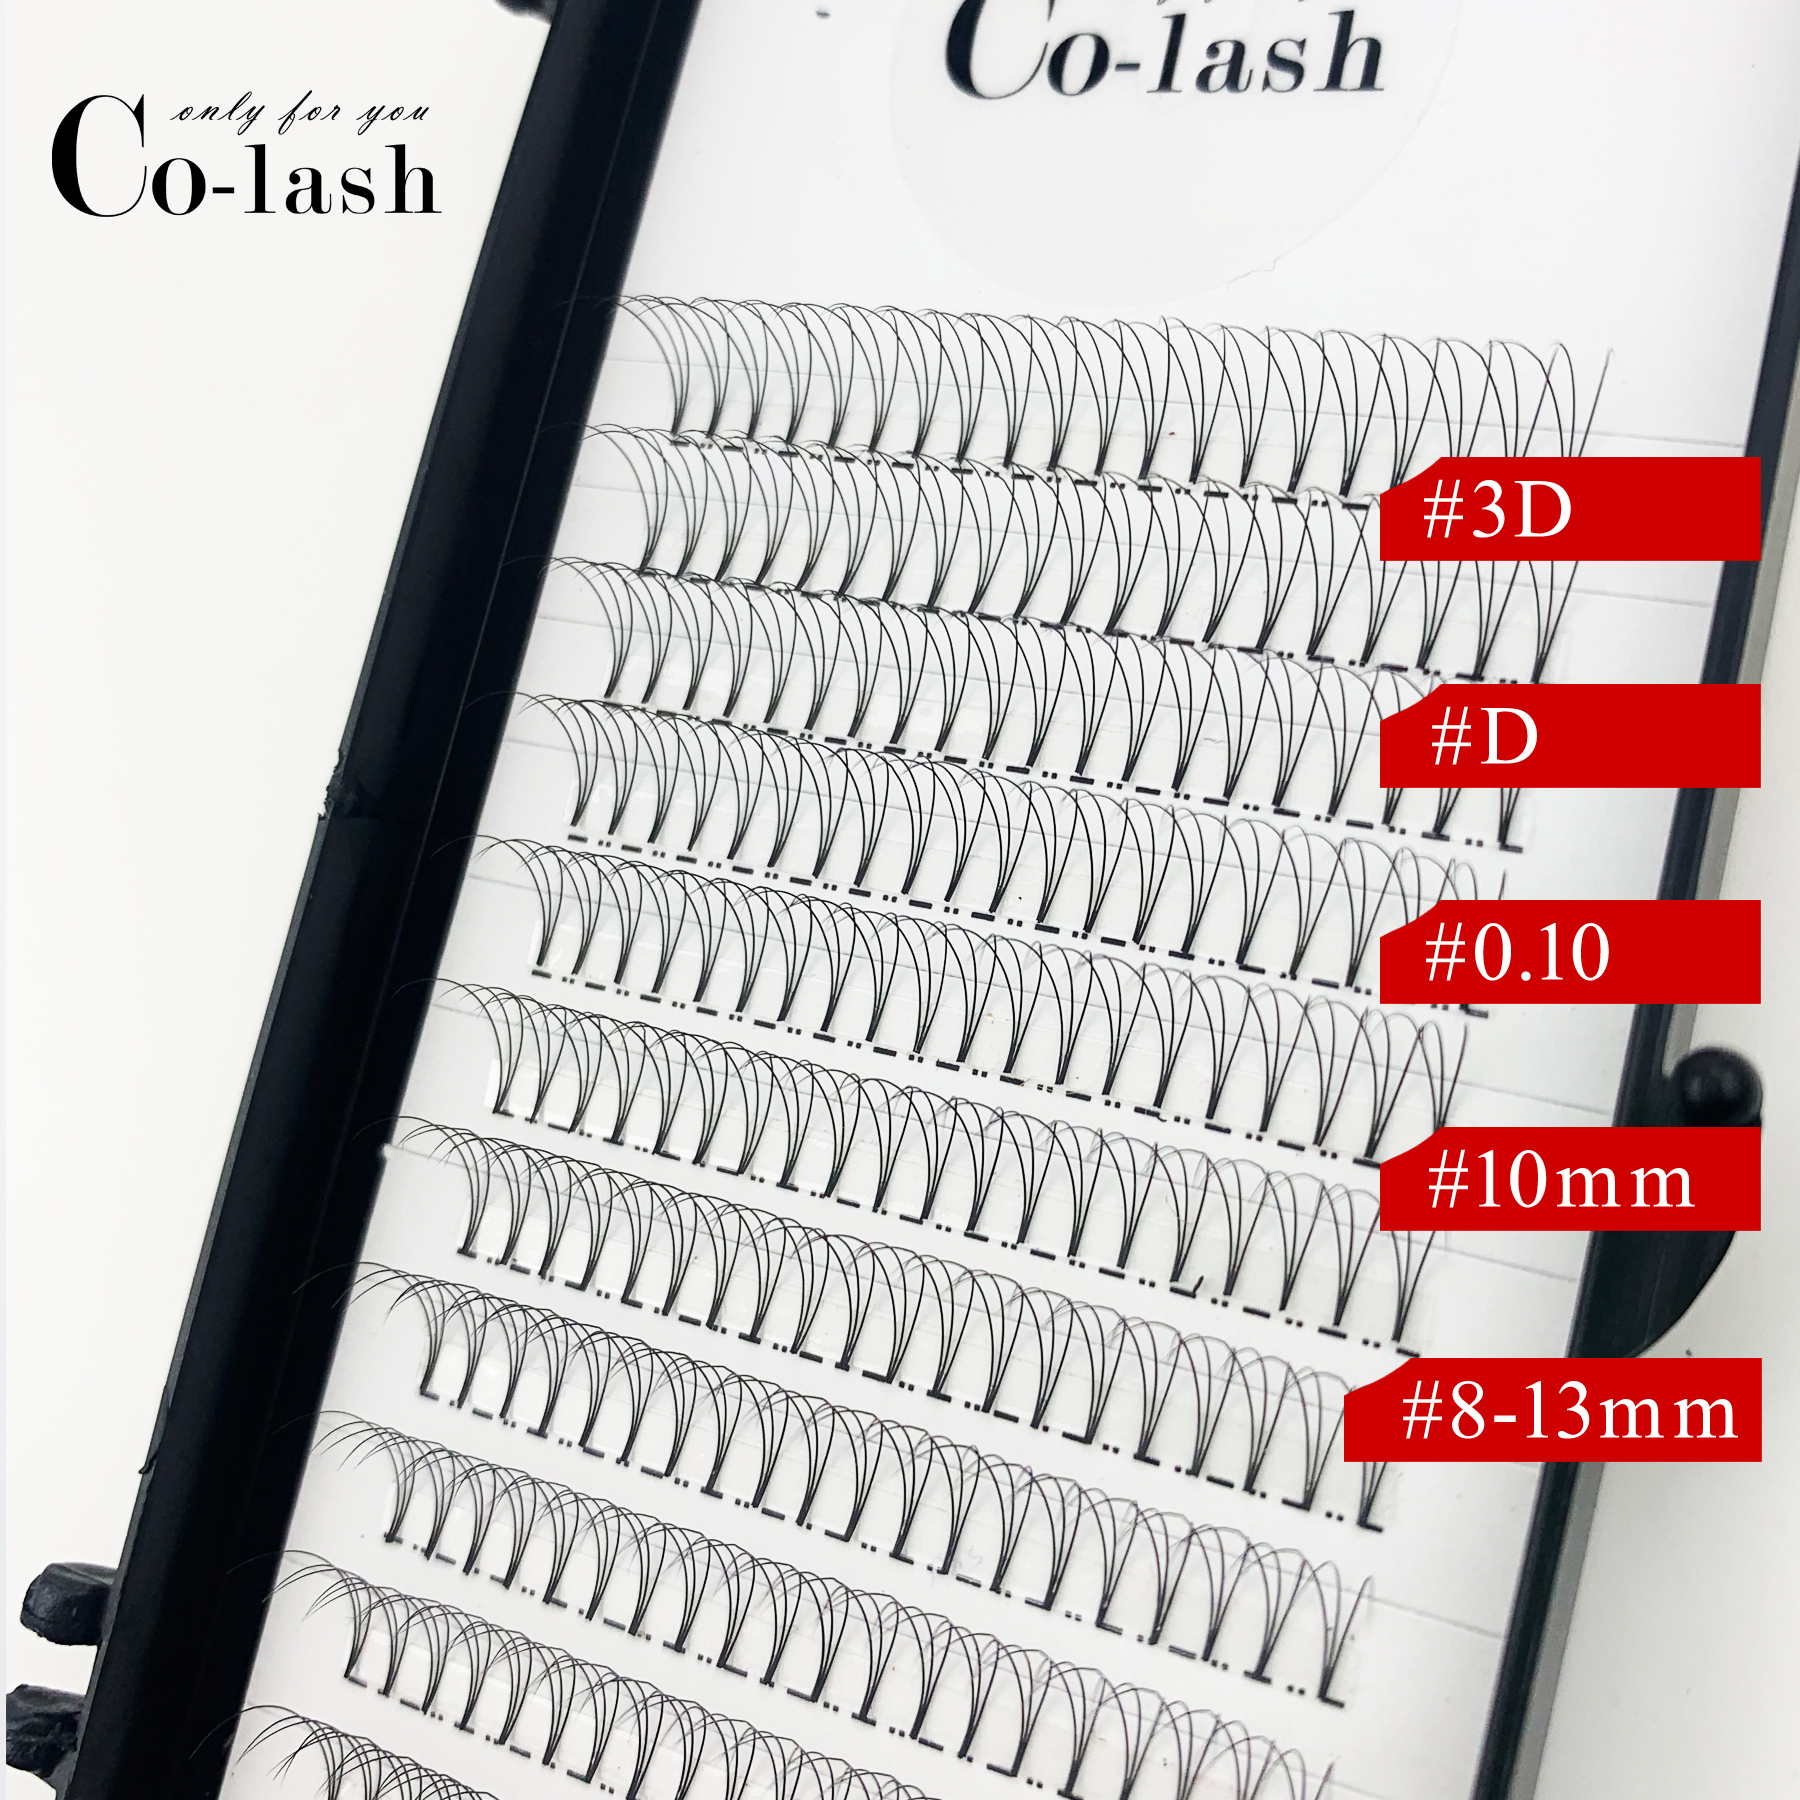 Colash 1 Box Russian Volume Eyelash 3D Eyelash Extensions 0.10mm Thickness D Curl Mink Strip Eyelashes Individual Lashes